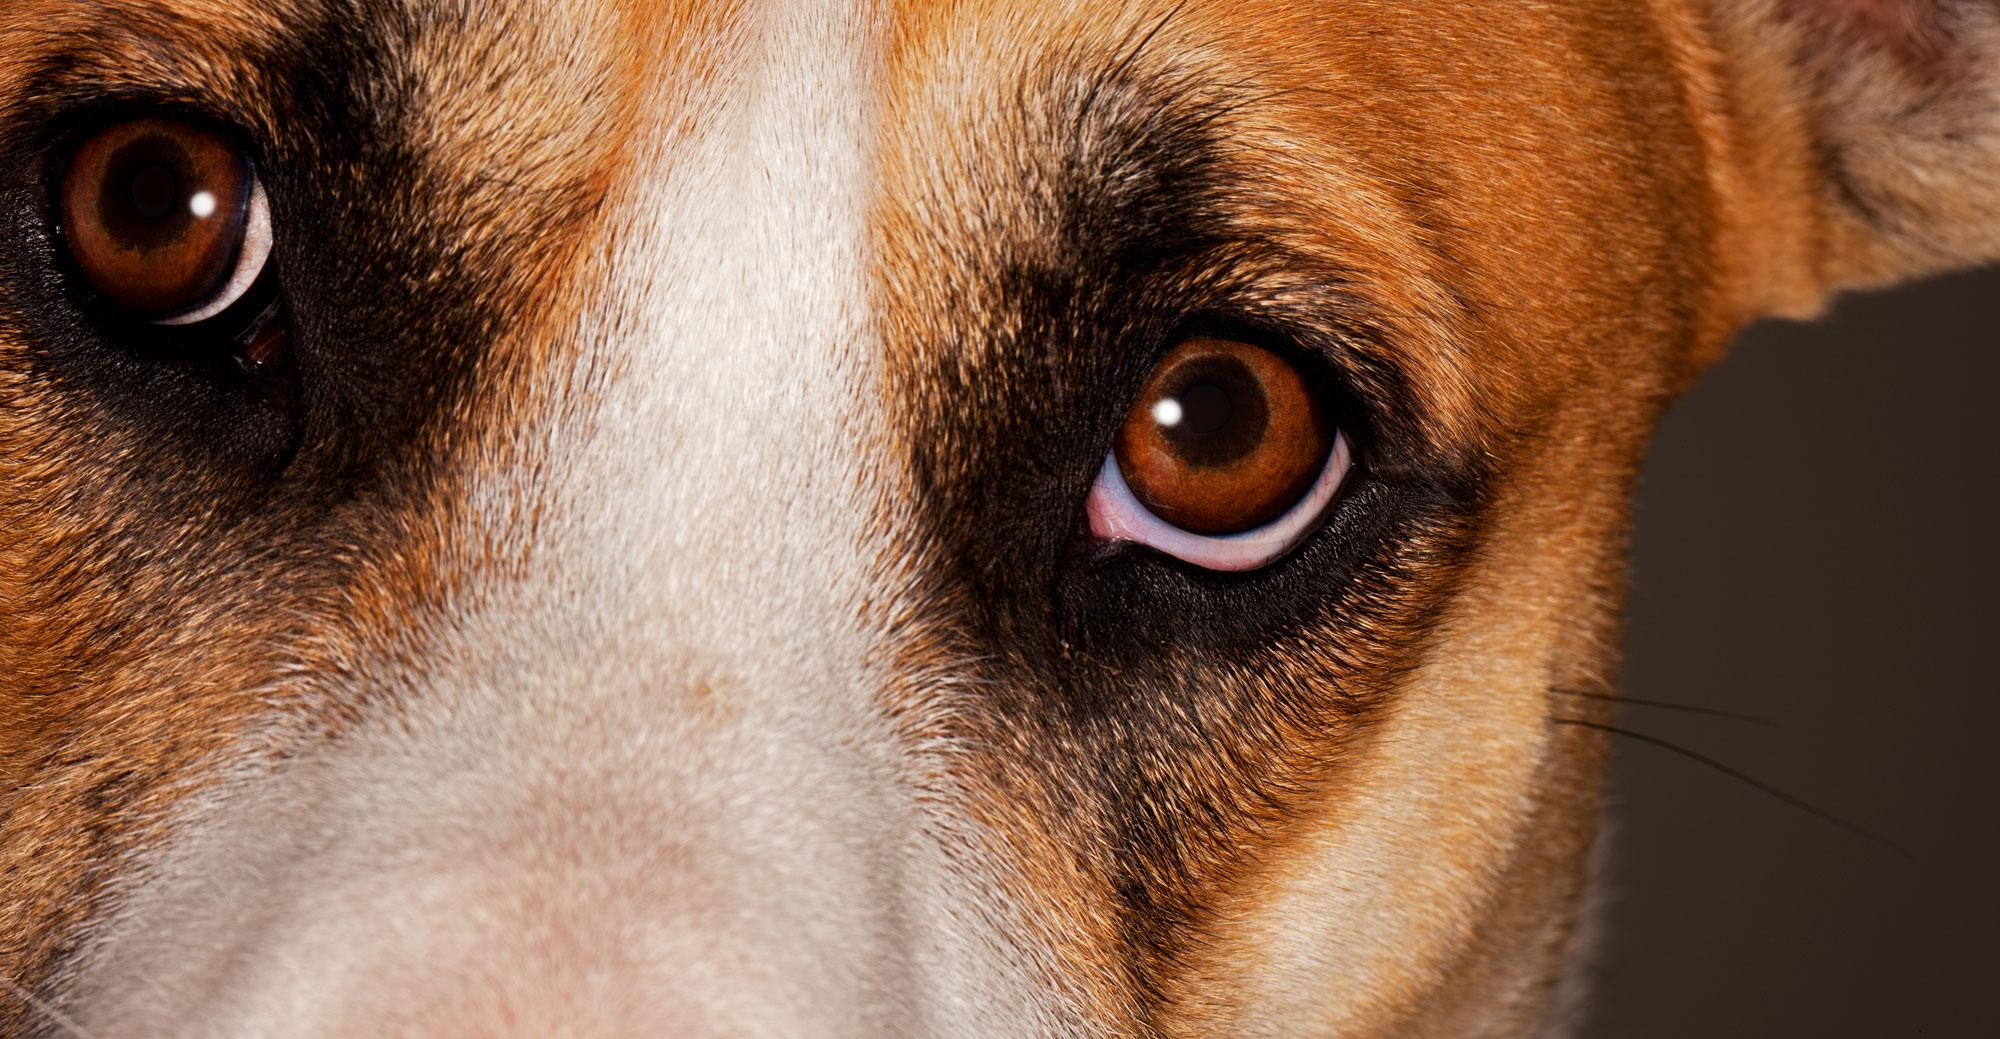 Dog eyes photographed by Steve Hoskins